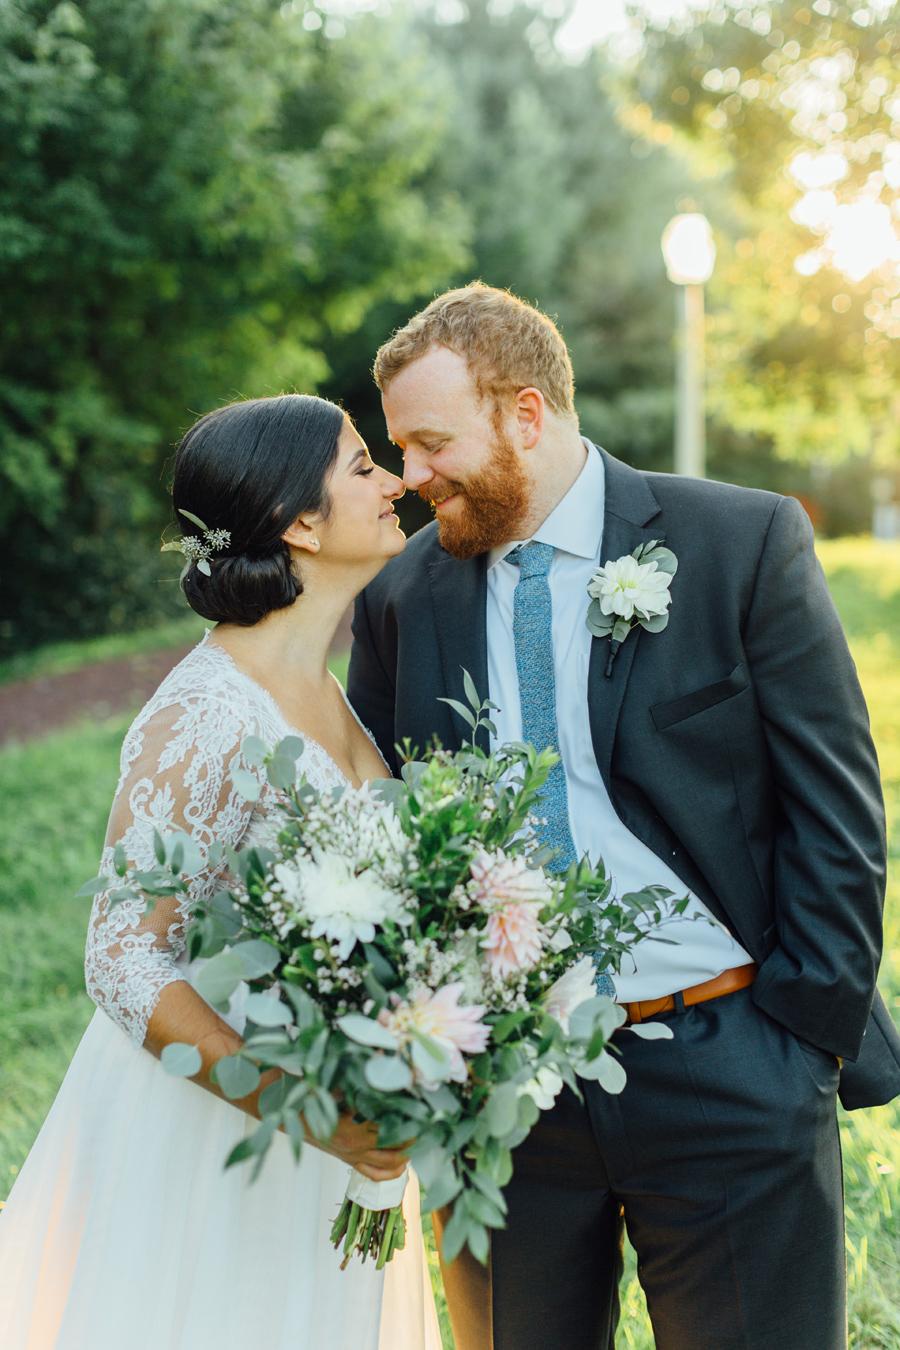 the-inn-at-leola-wedding-lancaster-pennsylvania-wedding-photographer-rebeka-viola-photograhy (76).jpg